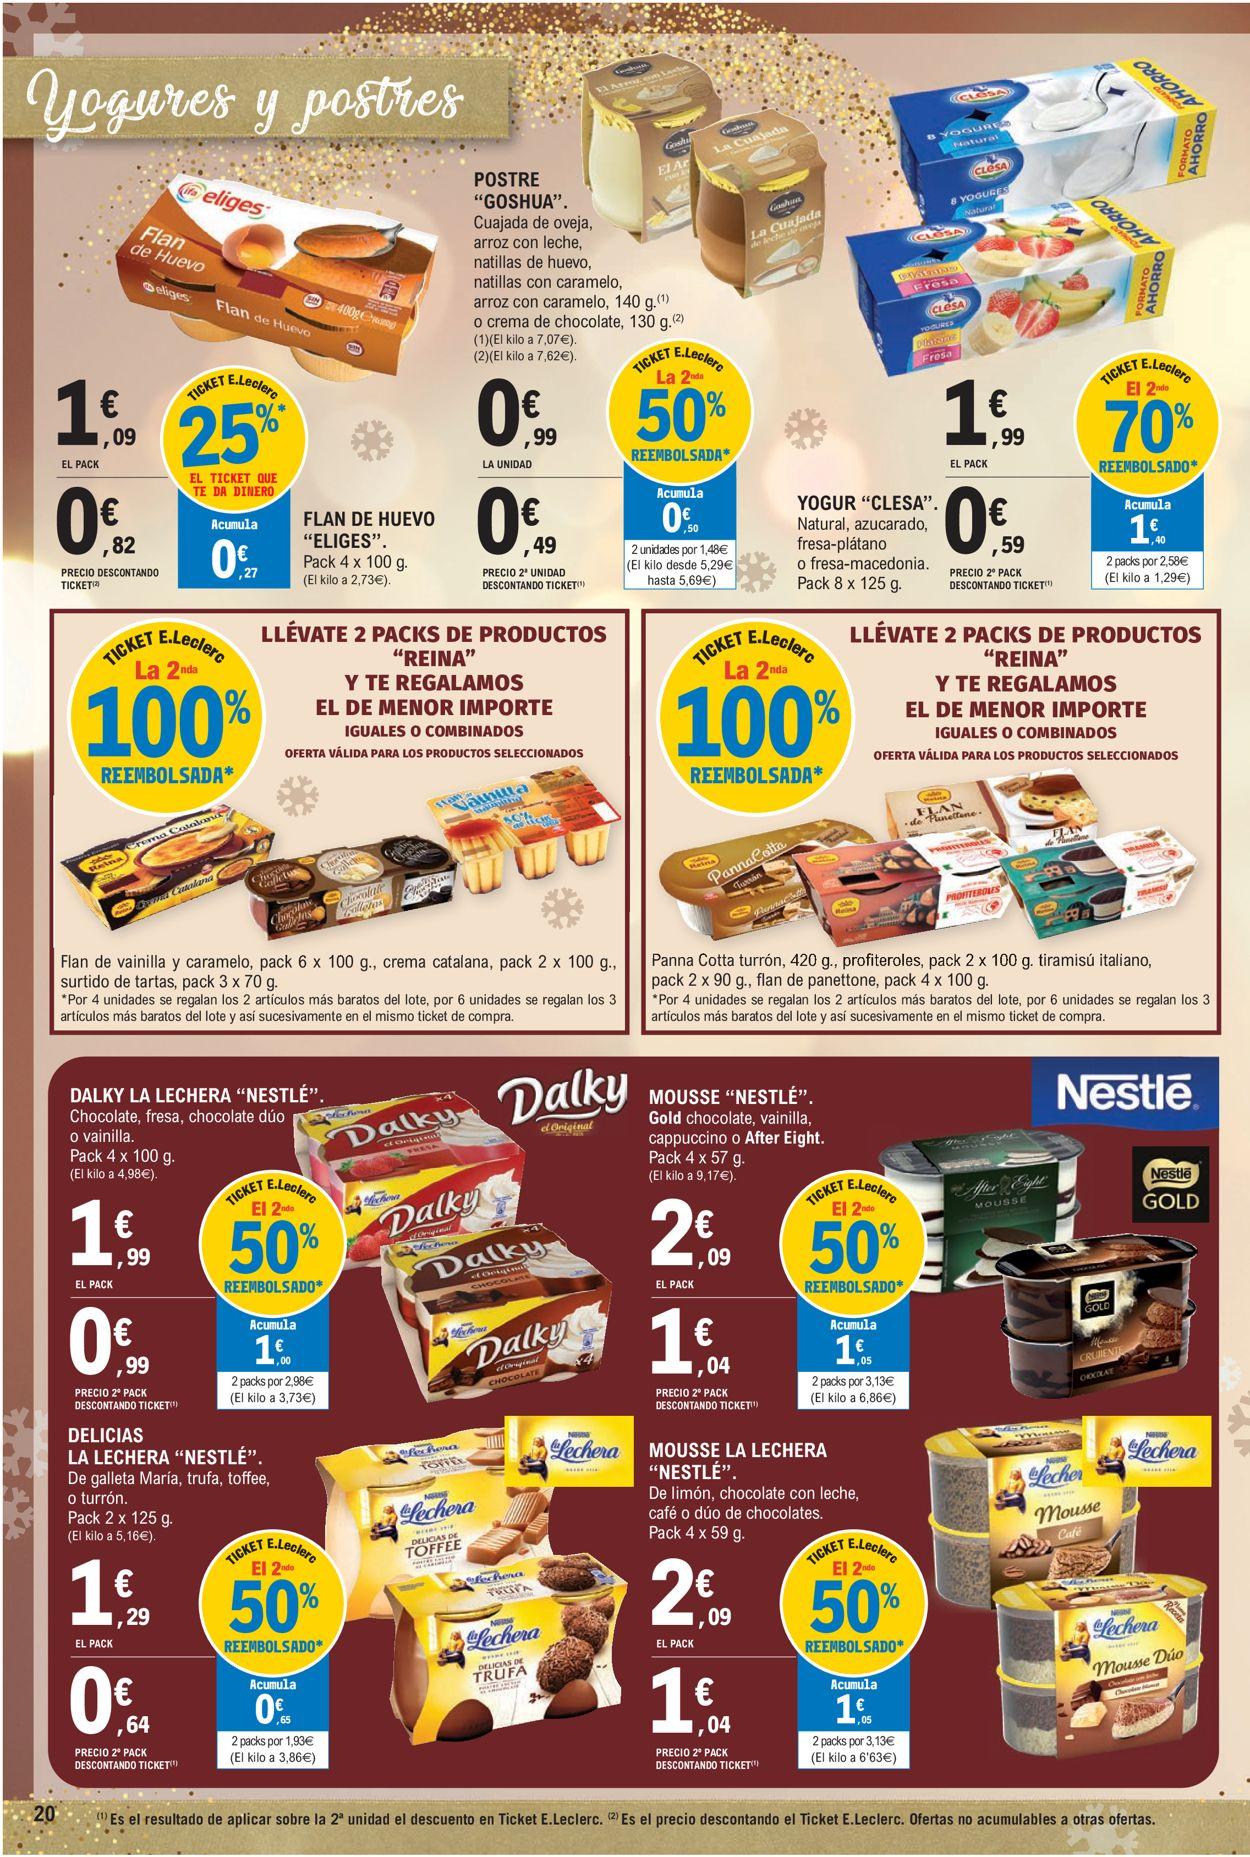 E.leclerc Navidad 2020 Folleto - 09.12-24.12.2020 (Página 20)